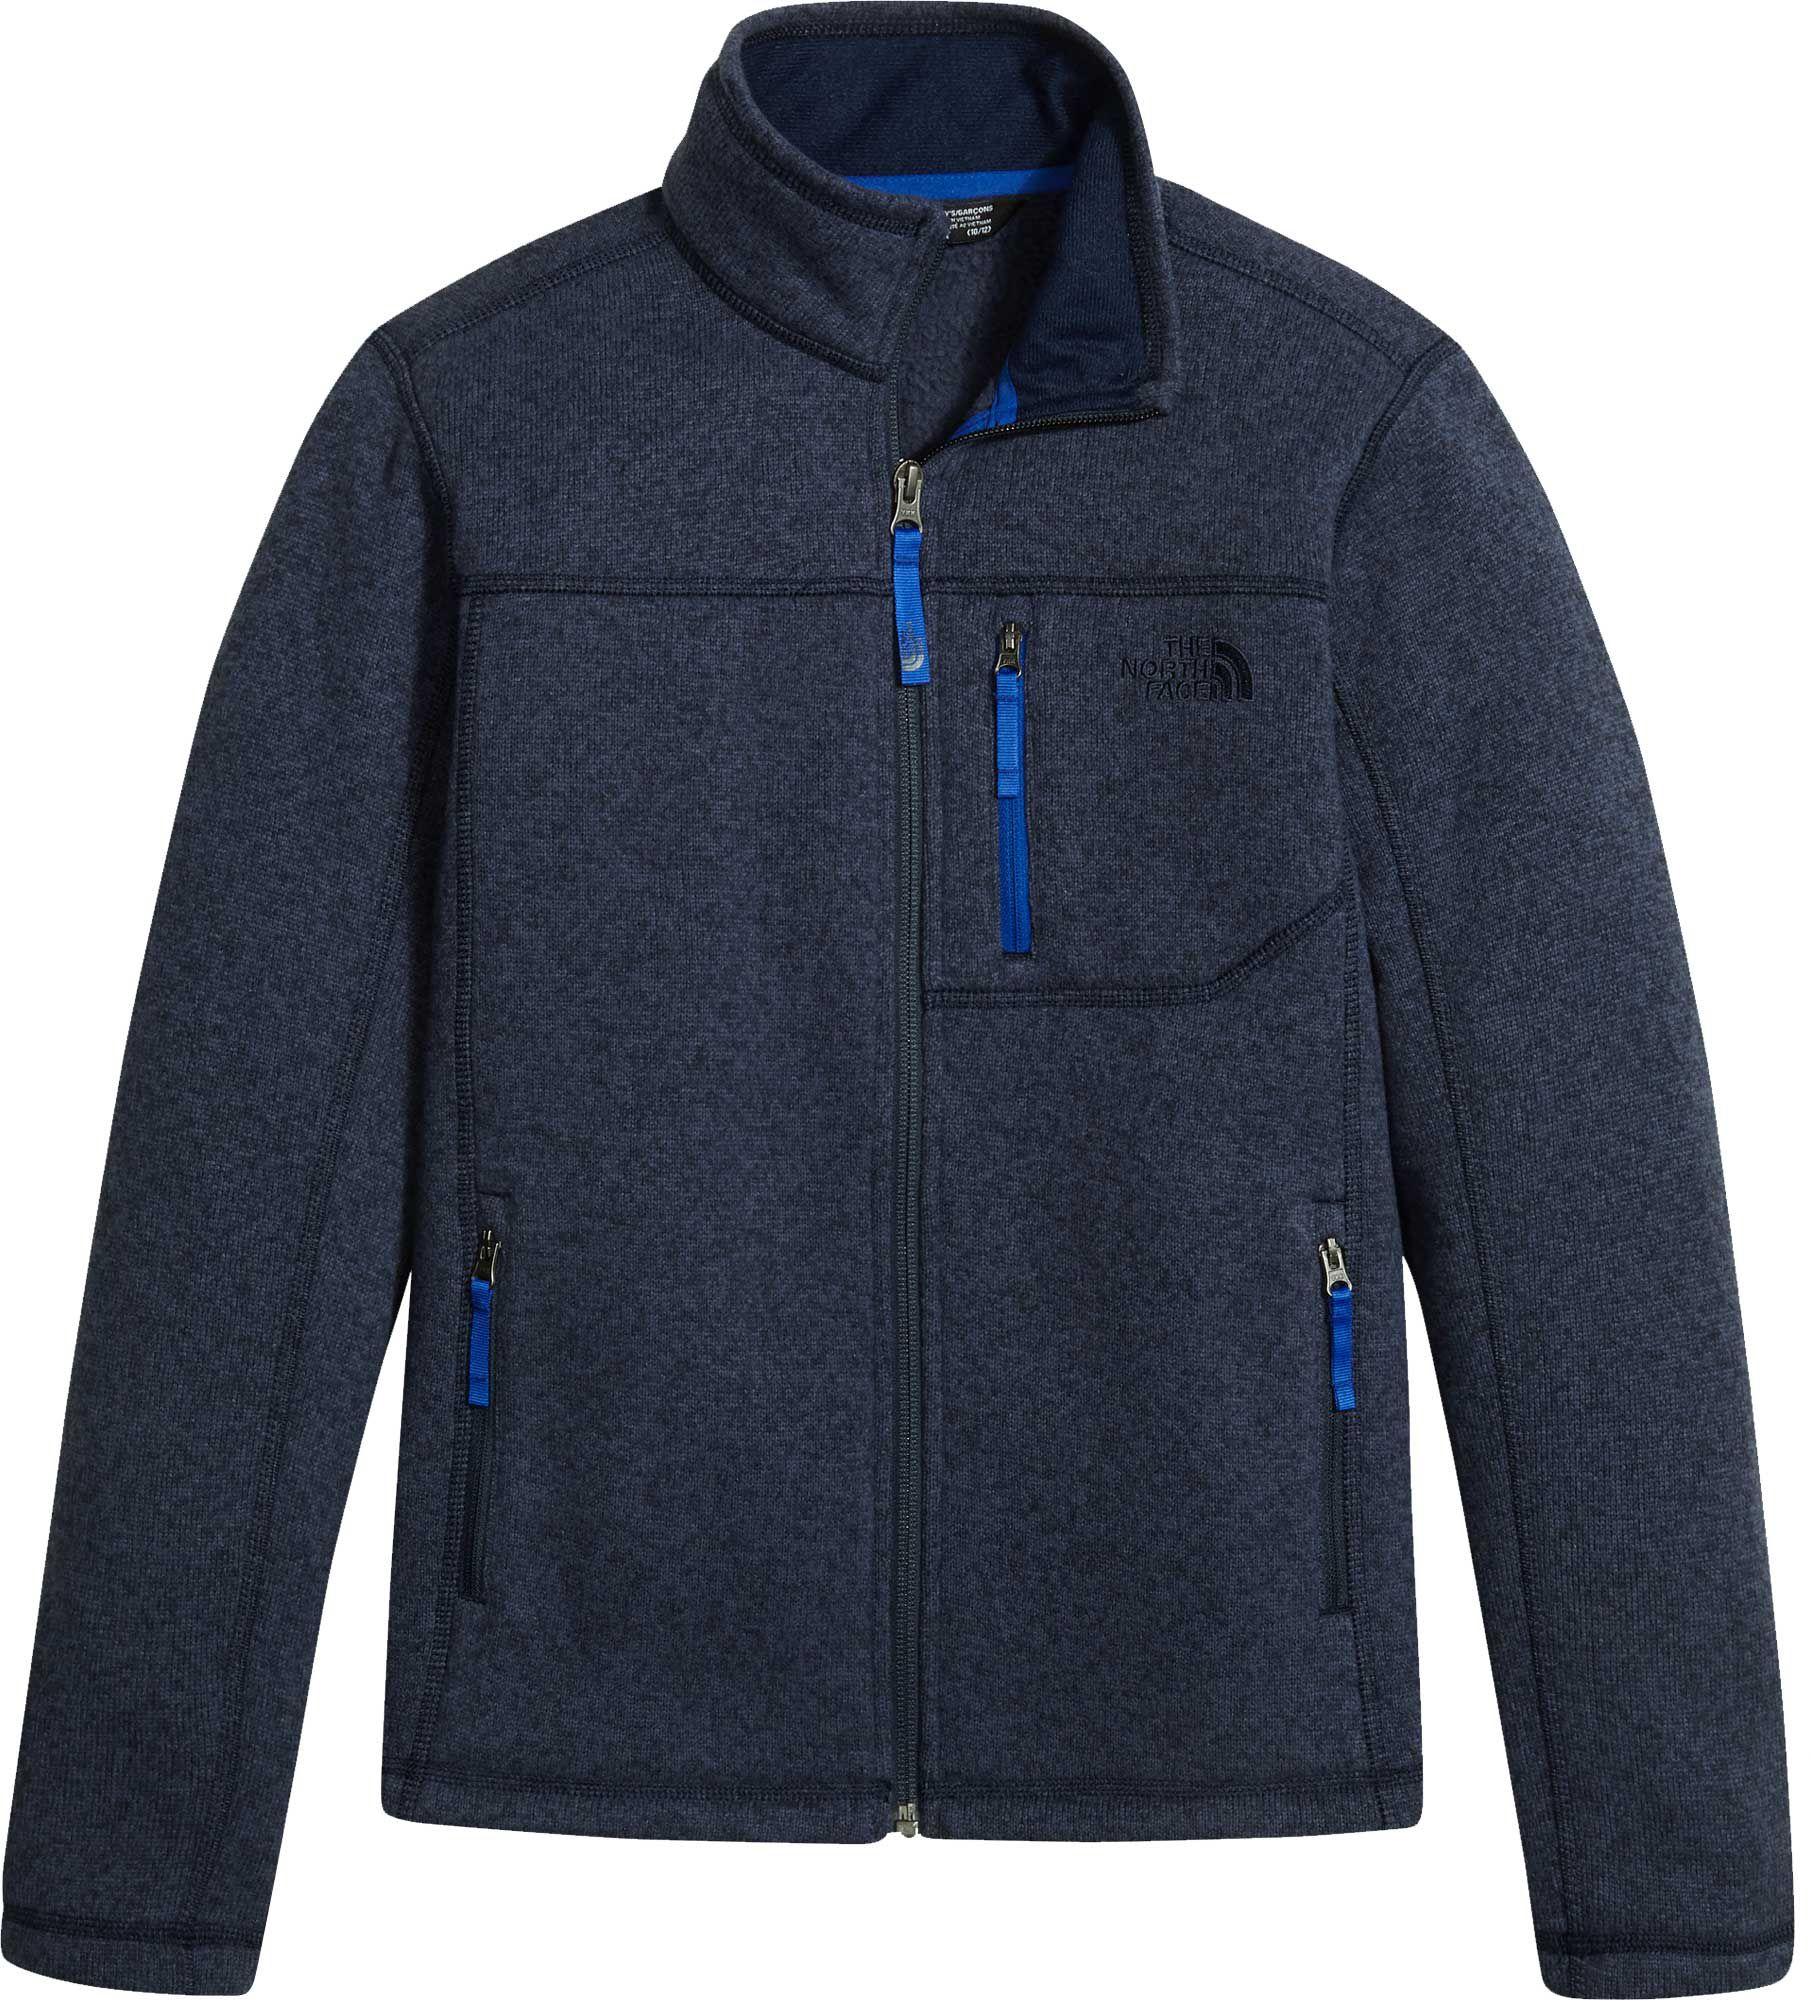 The North Face Boys' Gordon Lyons Full Zip Fleece Jacket - Past Season